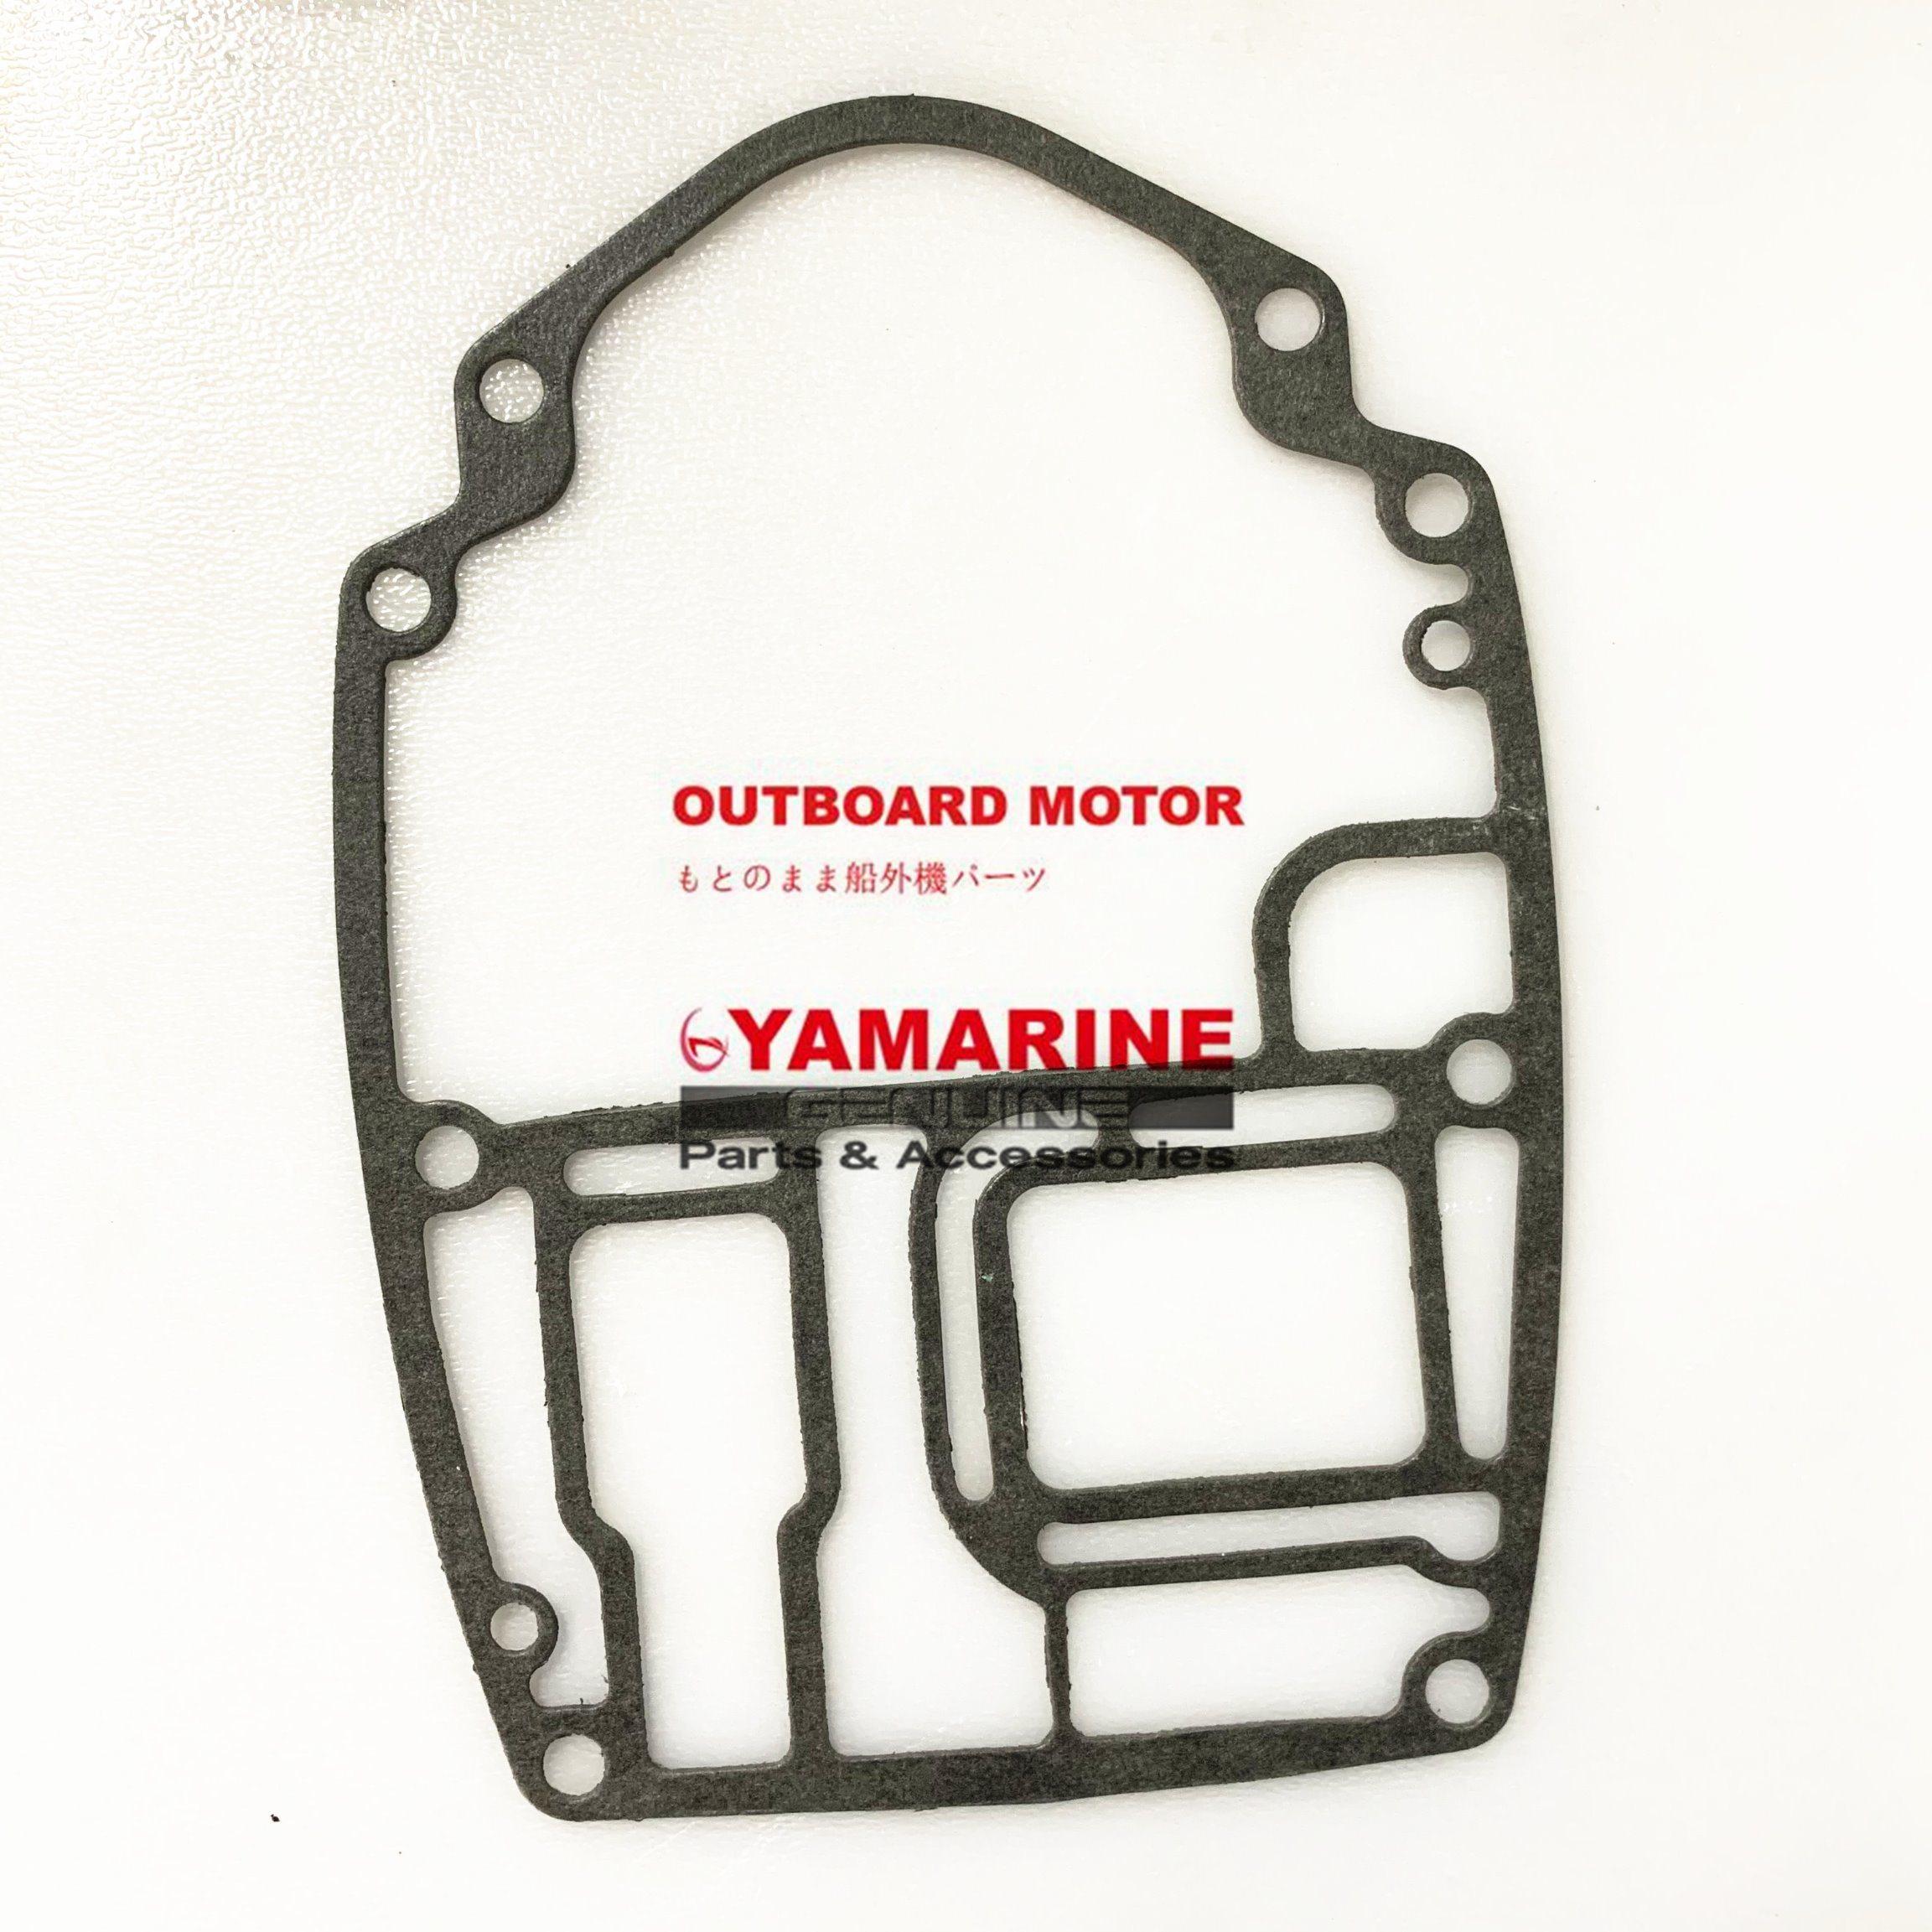 Boat Motor 63V-45113-A1 Upper Casing Gasket for Yamaha 2-Stroke 9.9hp 15hp